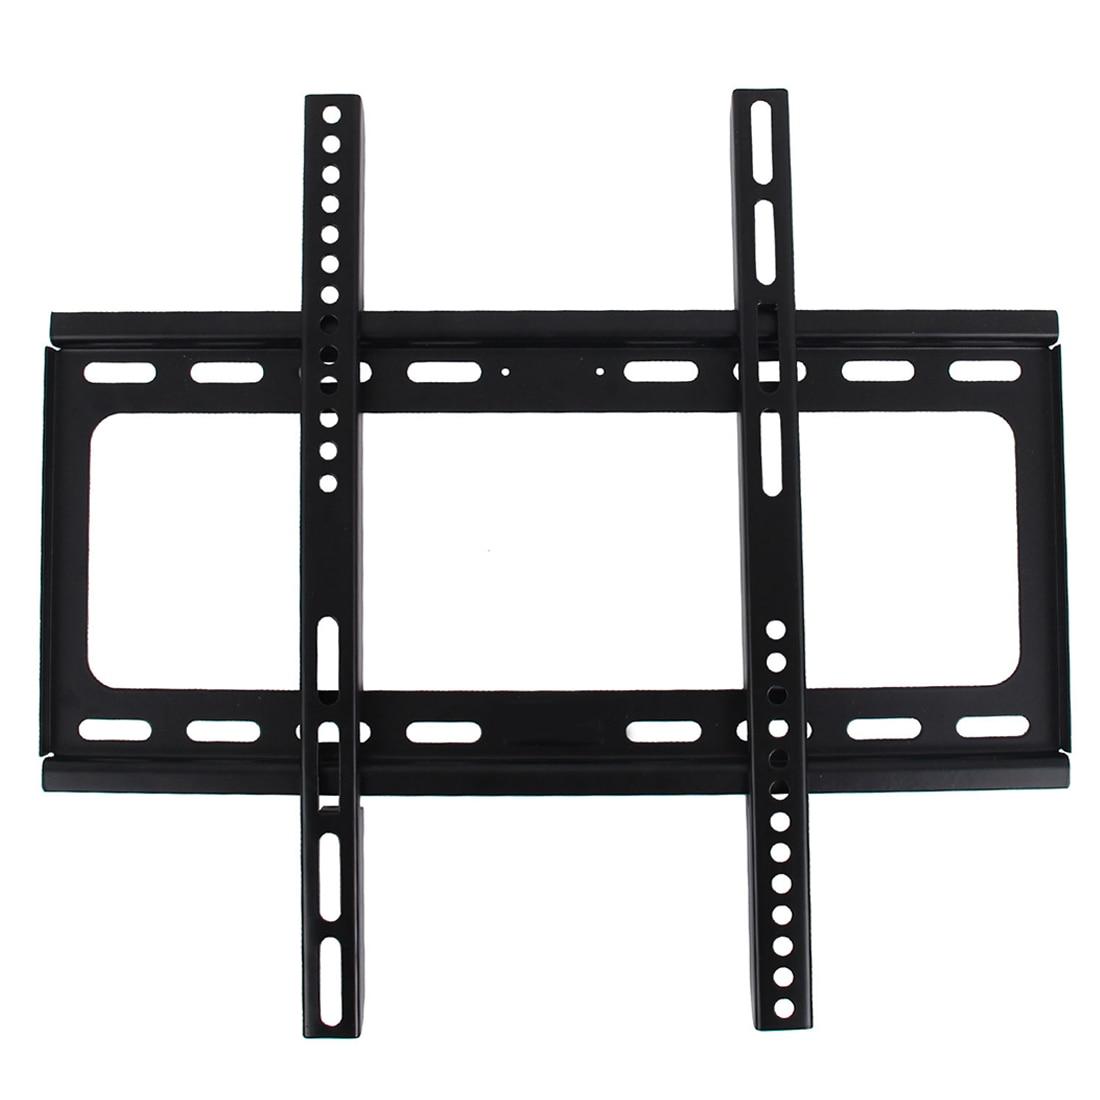 все цены на Plasma LCD LED 3D TV Wall Bracket Mount Slim 32 37 40 42 46 48 50 55 онлайн